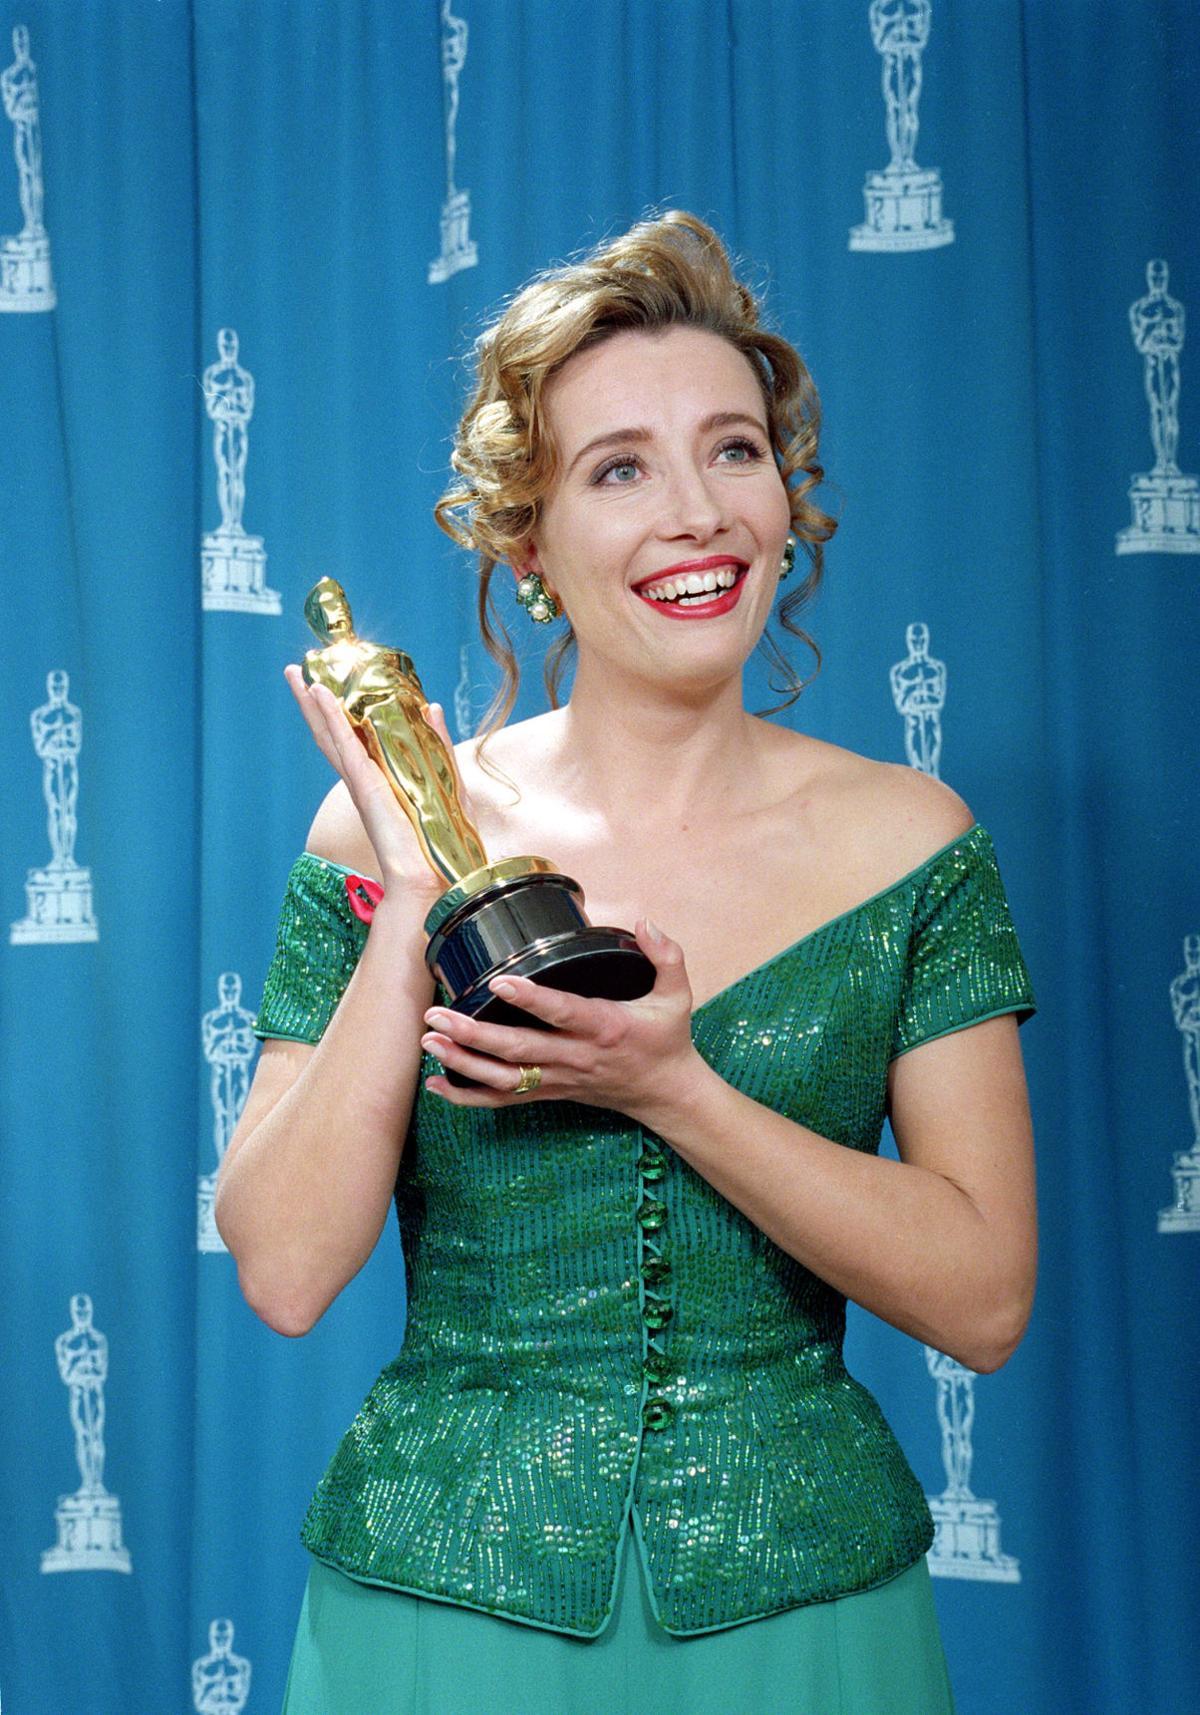 Photos: The Academy Awards through the years | Movies ...